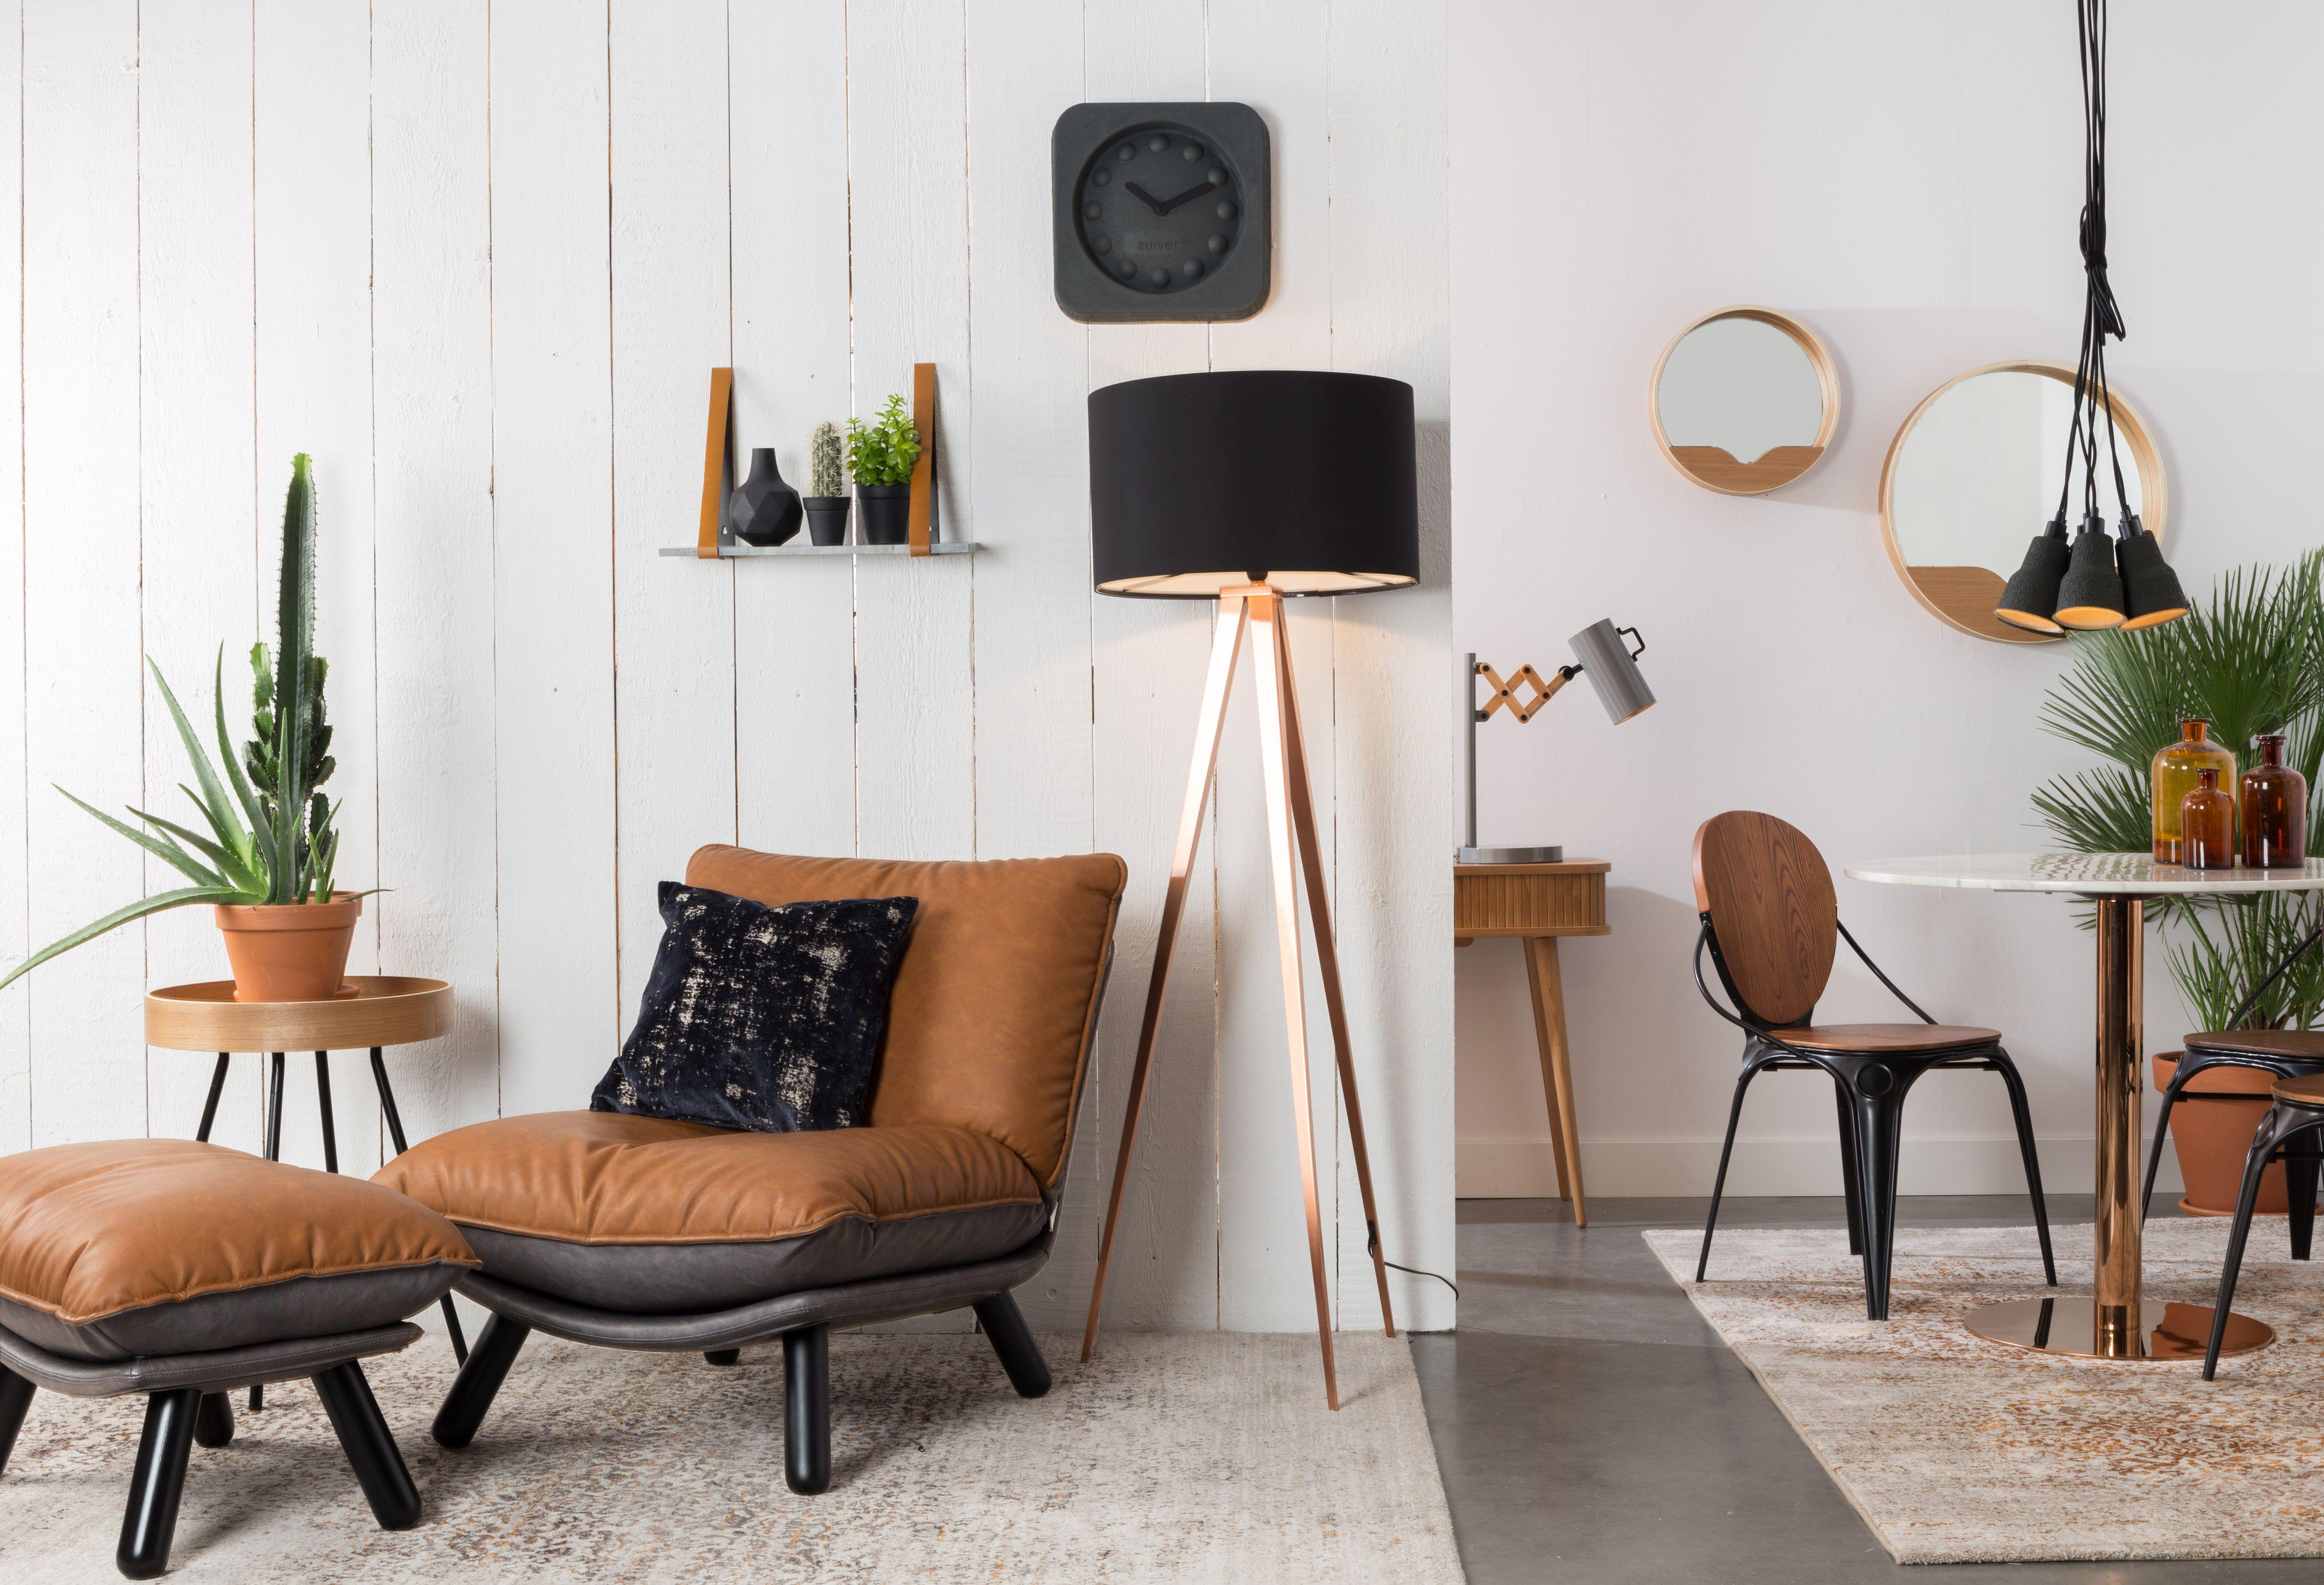 Lounge Stoel Hocker.Lazy Sack Hocker And Lounge Chair Meubel Ideeen